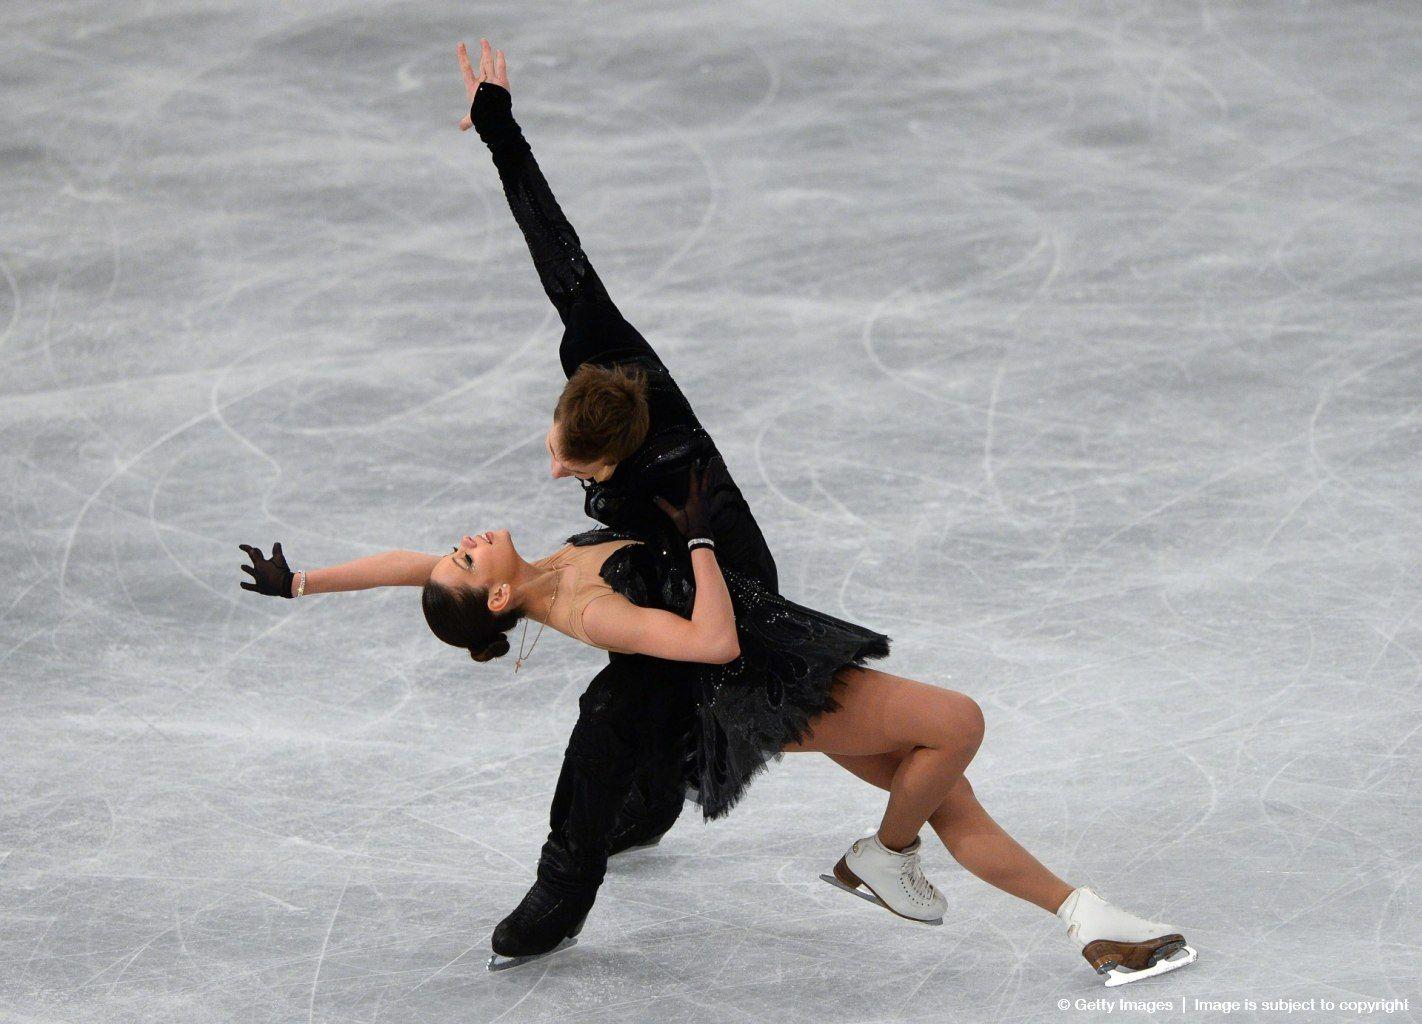 FSKATE-EUR-HUN-ICE DANCE-FREE